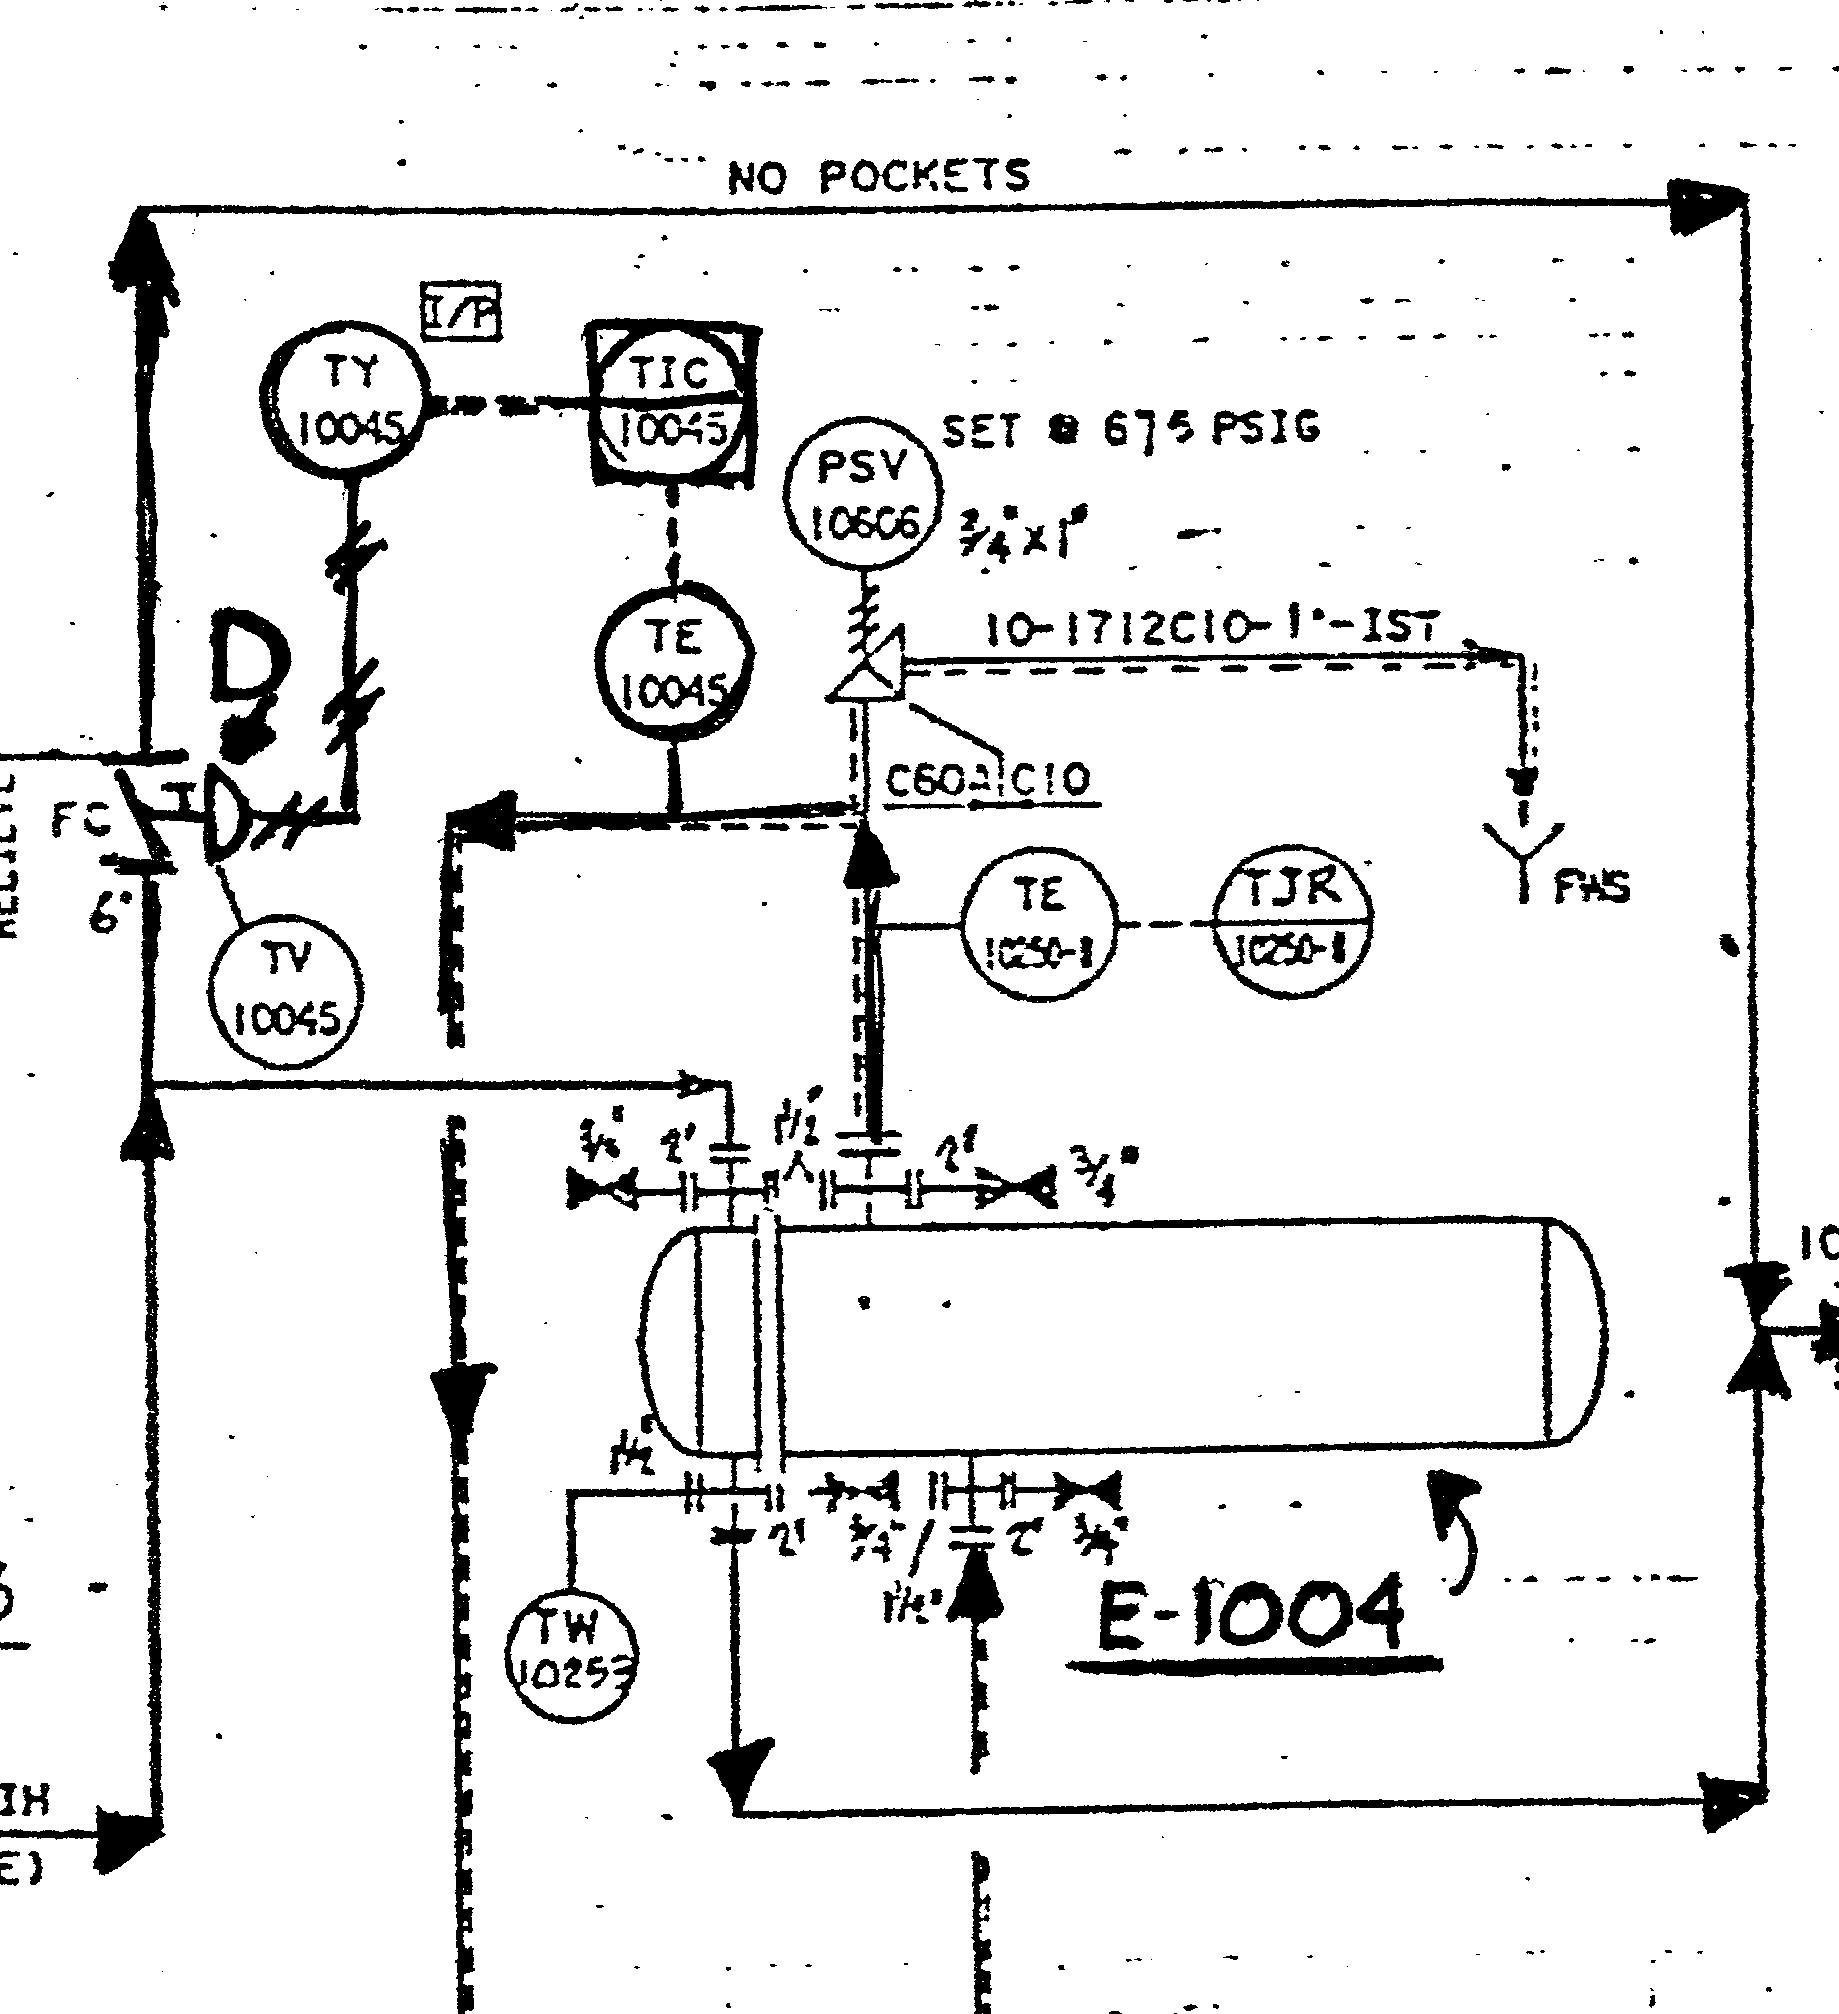 Process Tech Amp Oper Acad